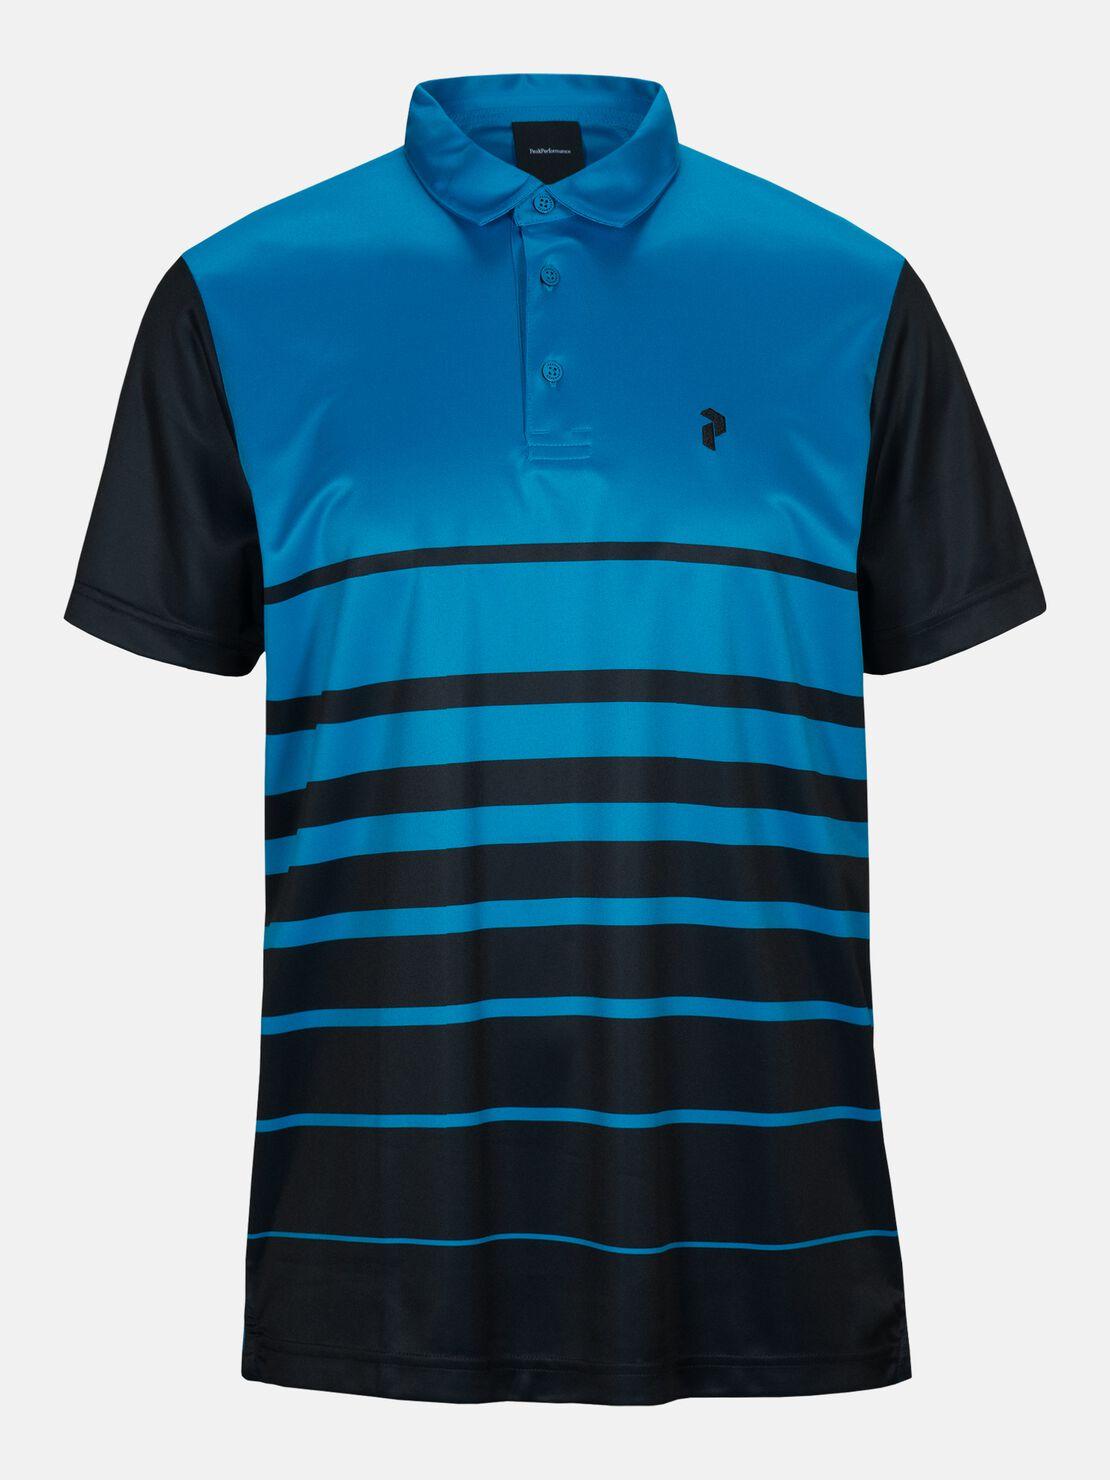 Peak Performance Golf Bandon Print Polo Vit